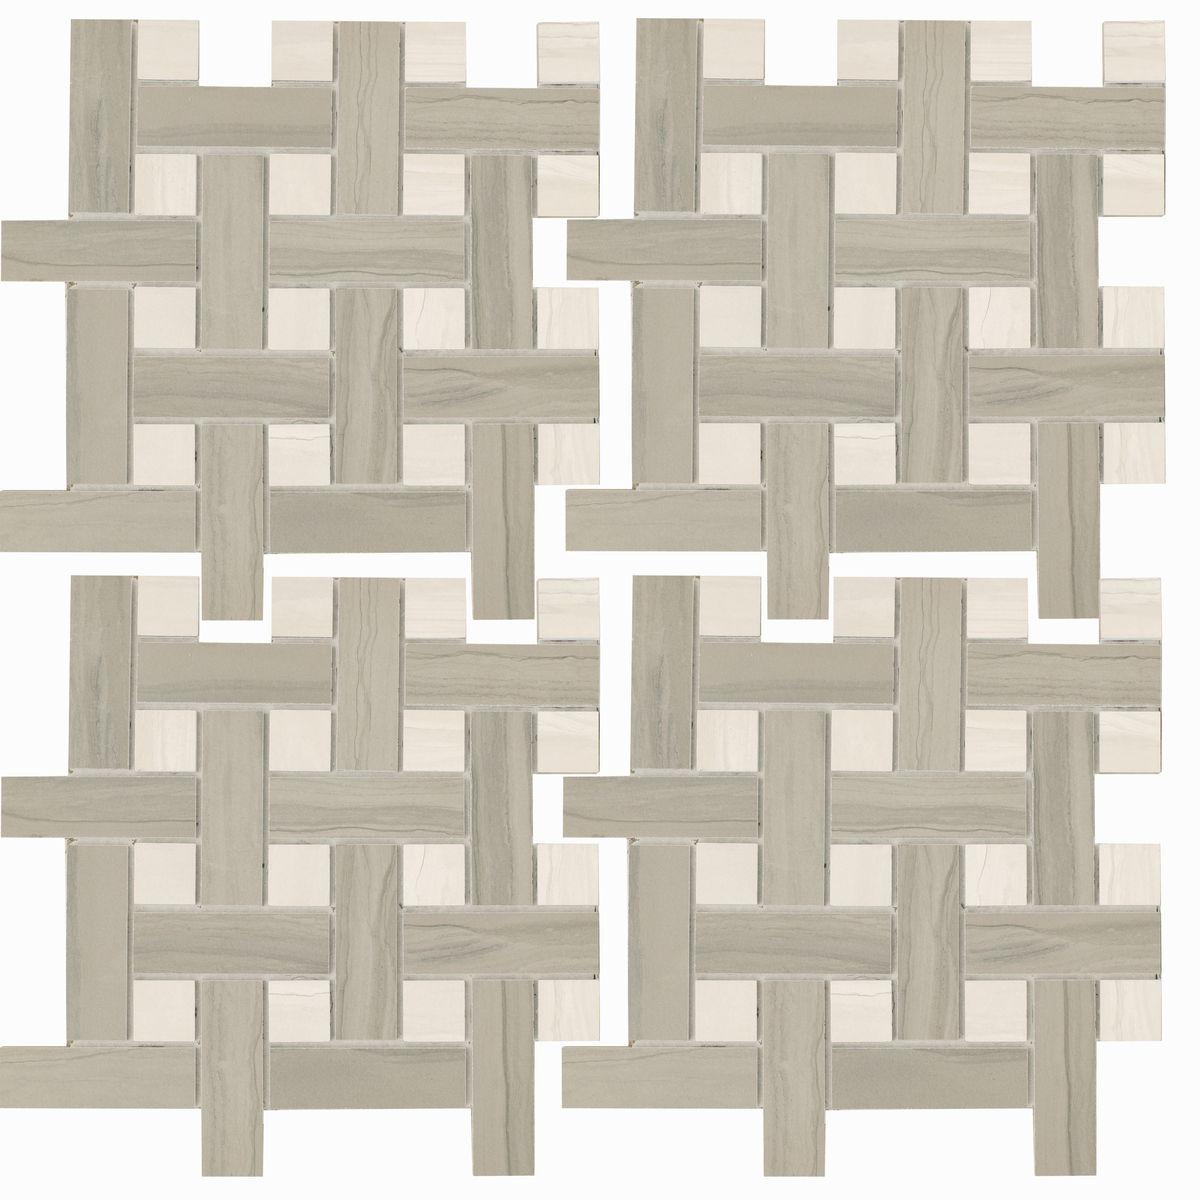 Мозаика BIANCO Marmo Acero Bianco (mmcxma18) изображение 0